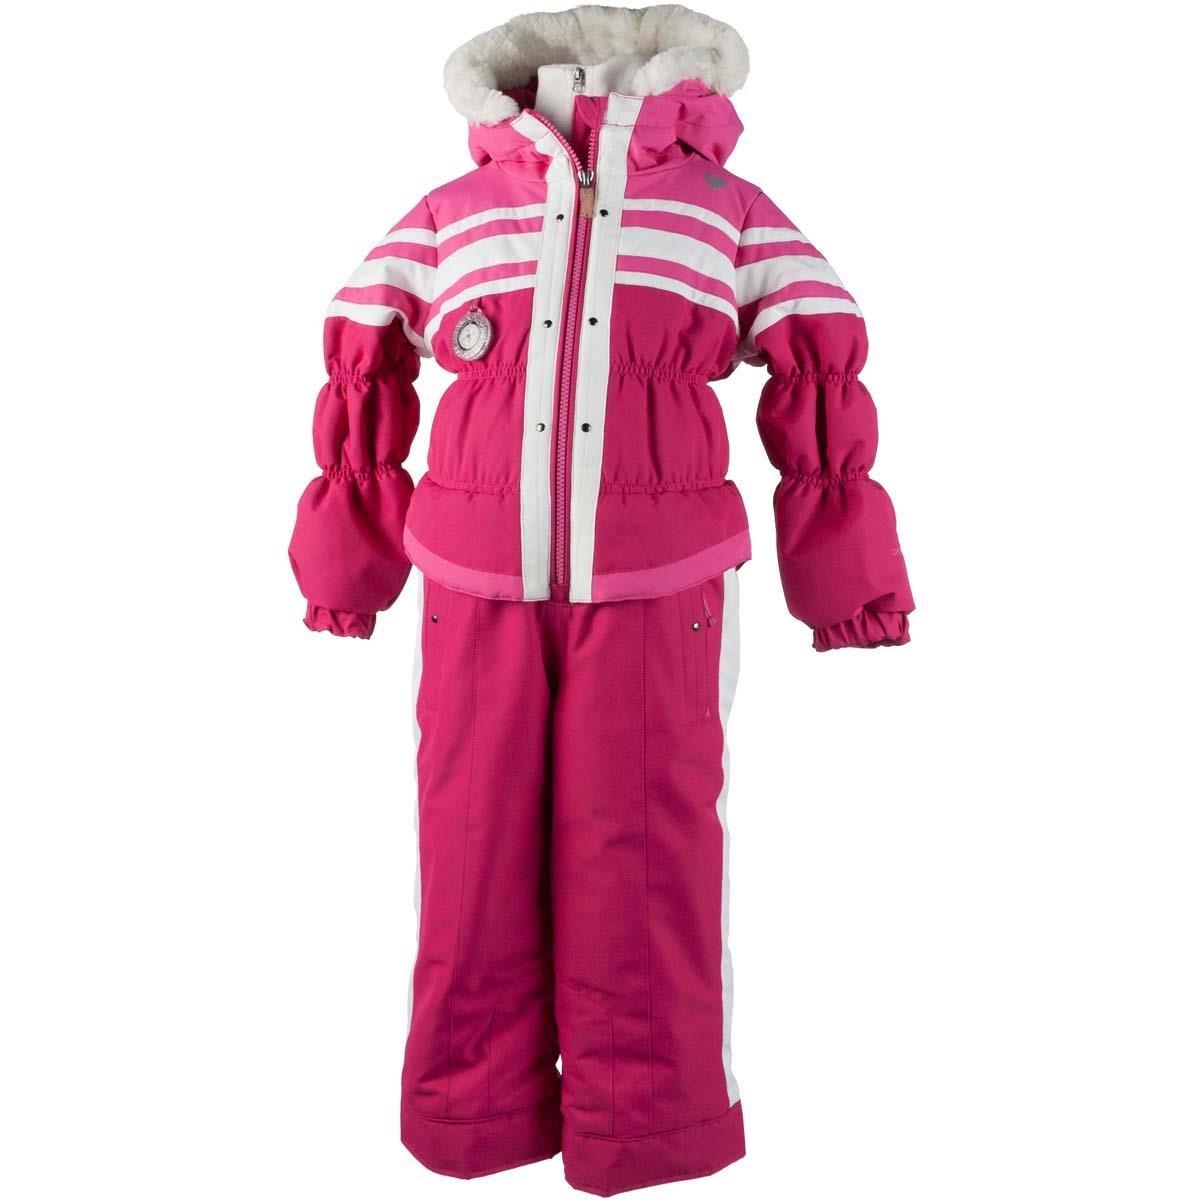 Obermeyer Kids Baby Girl's Skiter Suit (Toddler/Little Kids/Big Kids) Glamour Pink Suit